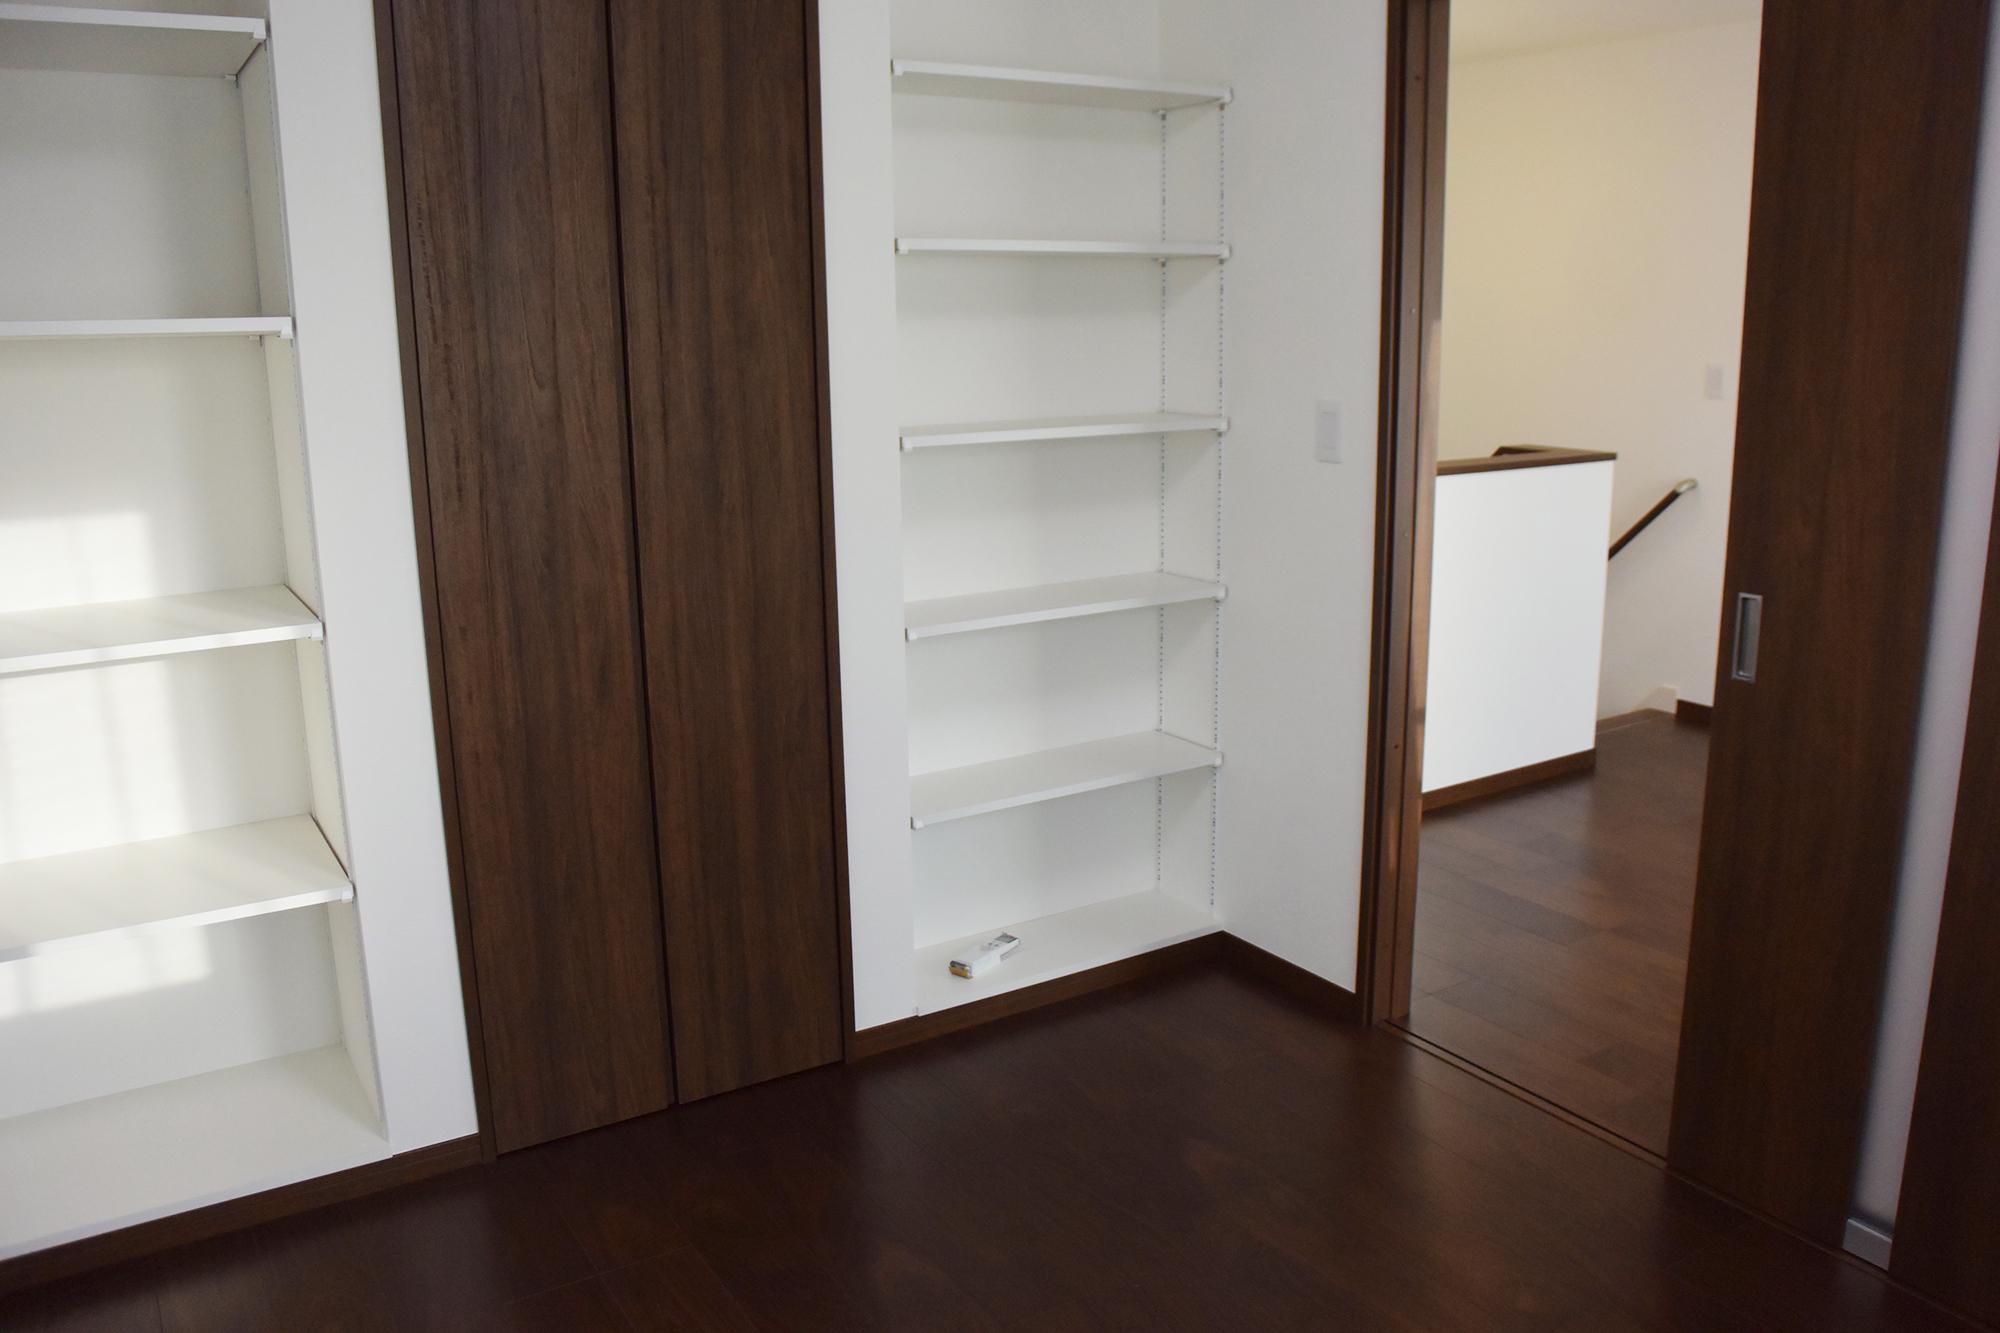 2Fには収納たっぷりの子供室が二部屋設けられました。